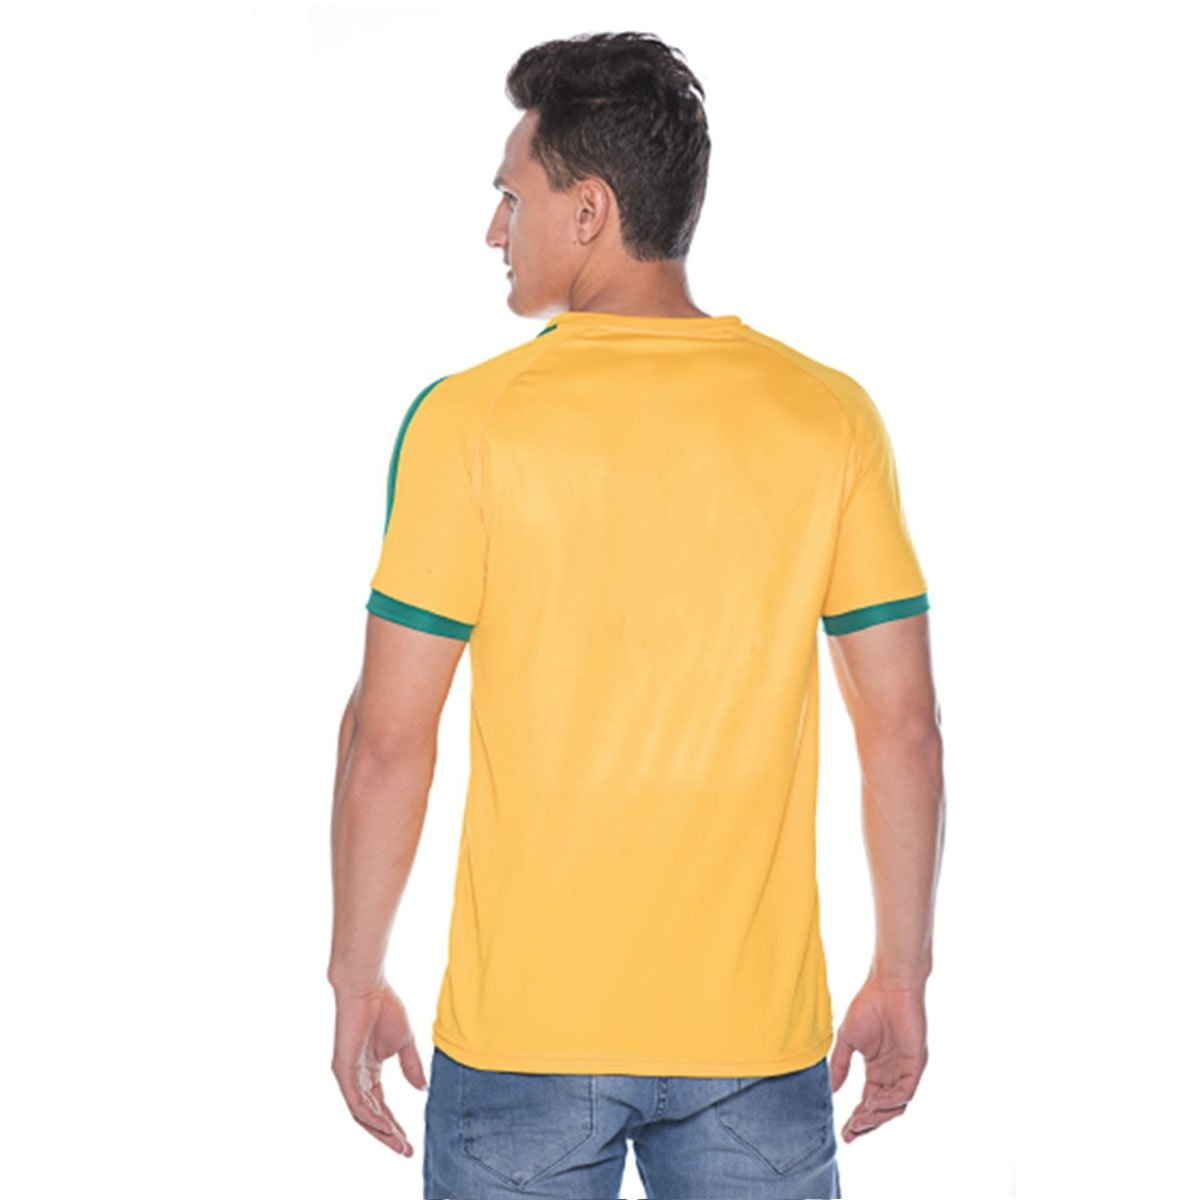 Camisa Brasil Super Bolla Nº Sem 2018 Camisa Pro Amarelo Brasil 8xq0Erw48